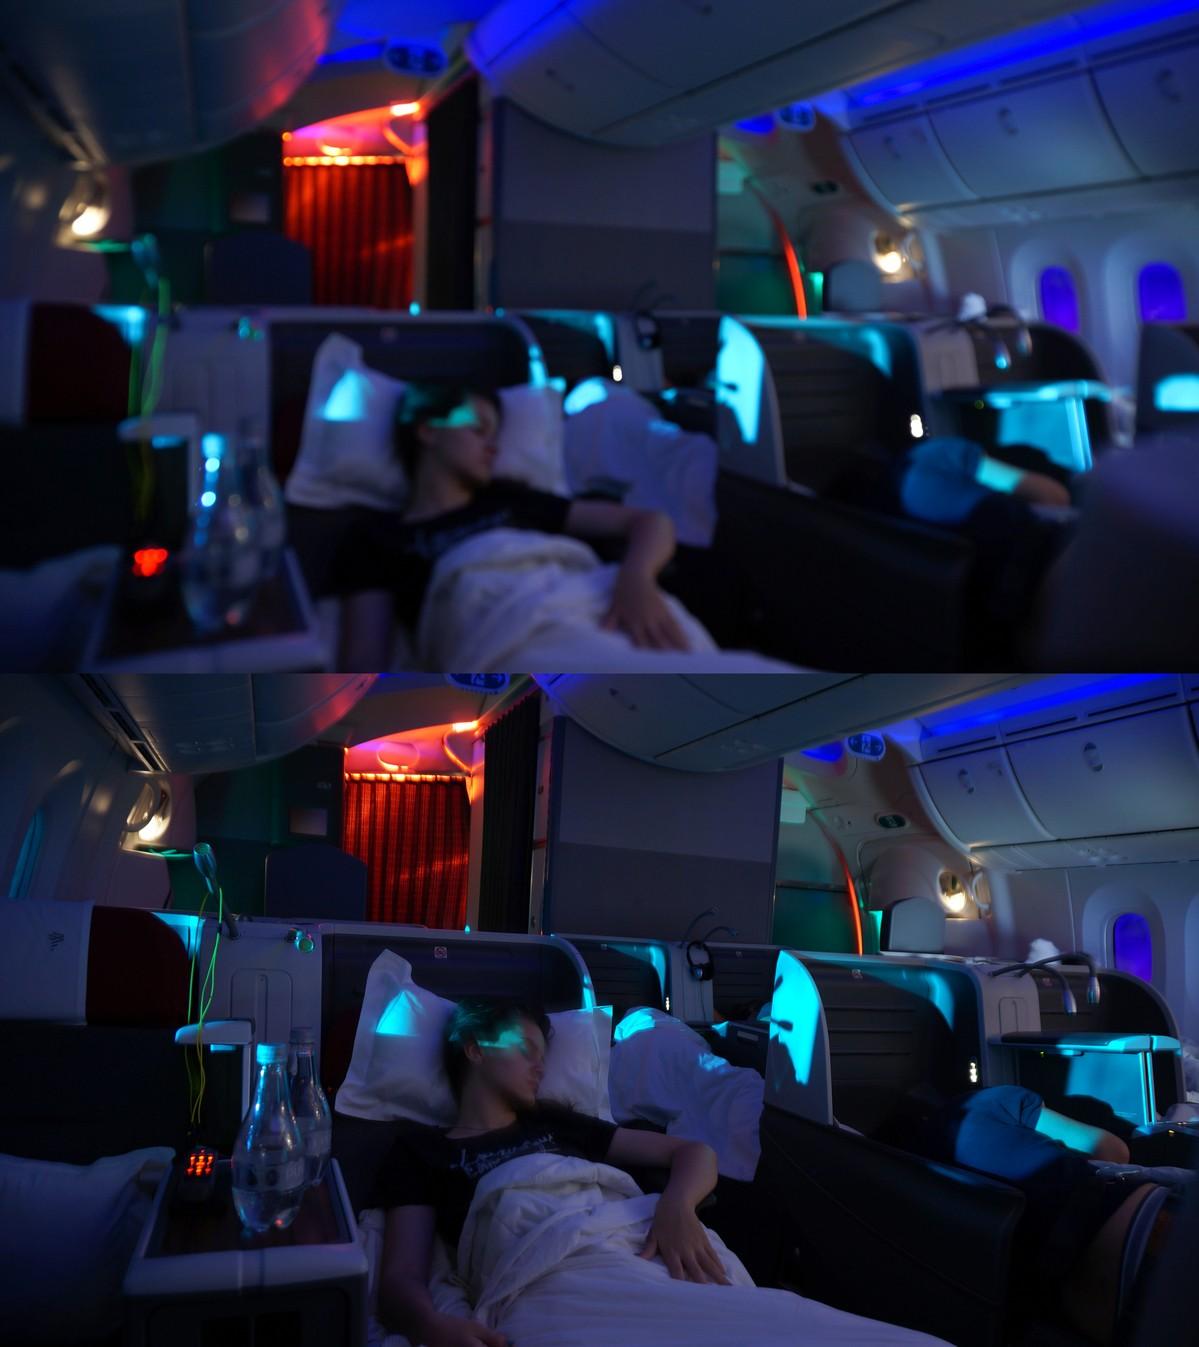 Re: [原创]【 寰球十万八千里   上集   取道南美 】 BOEING 787-9 CC-BGI 空中